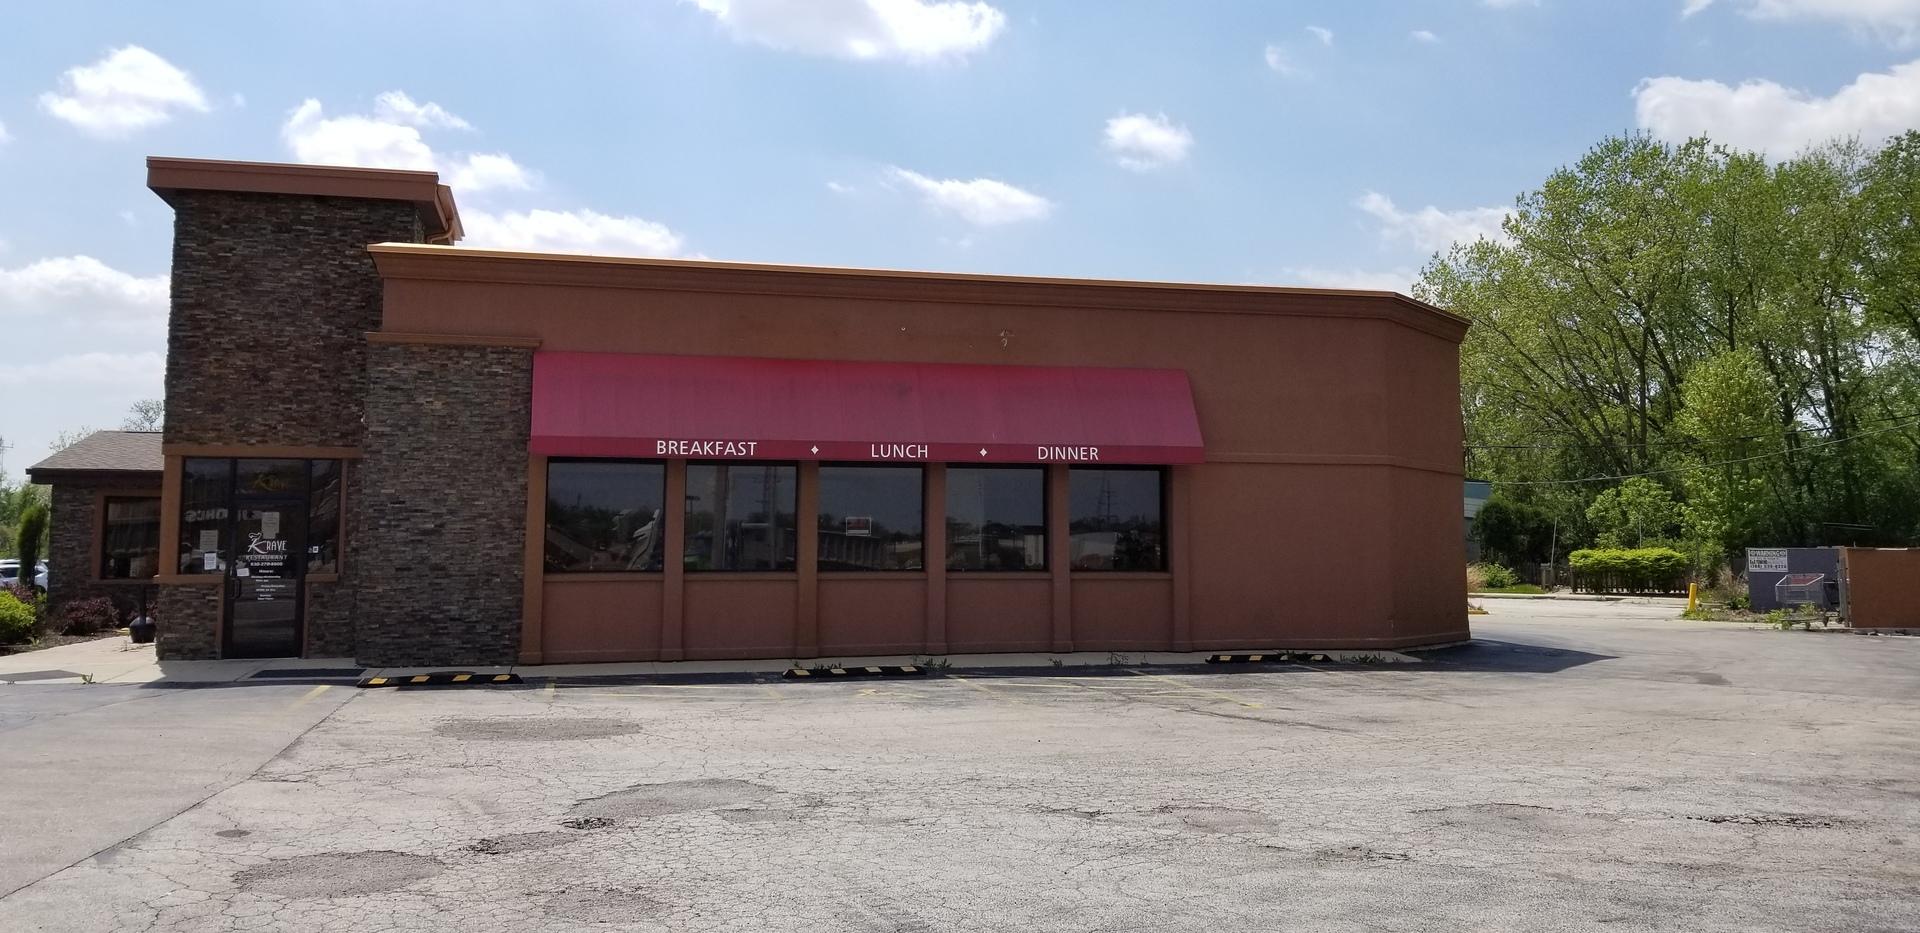 601-60 St Charles Rd, Elmhurst, IL 60126